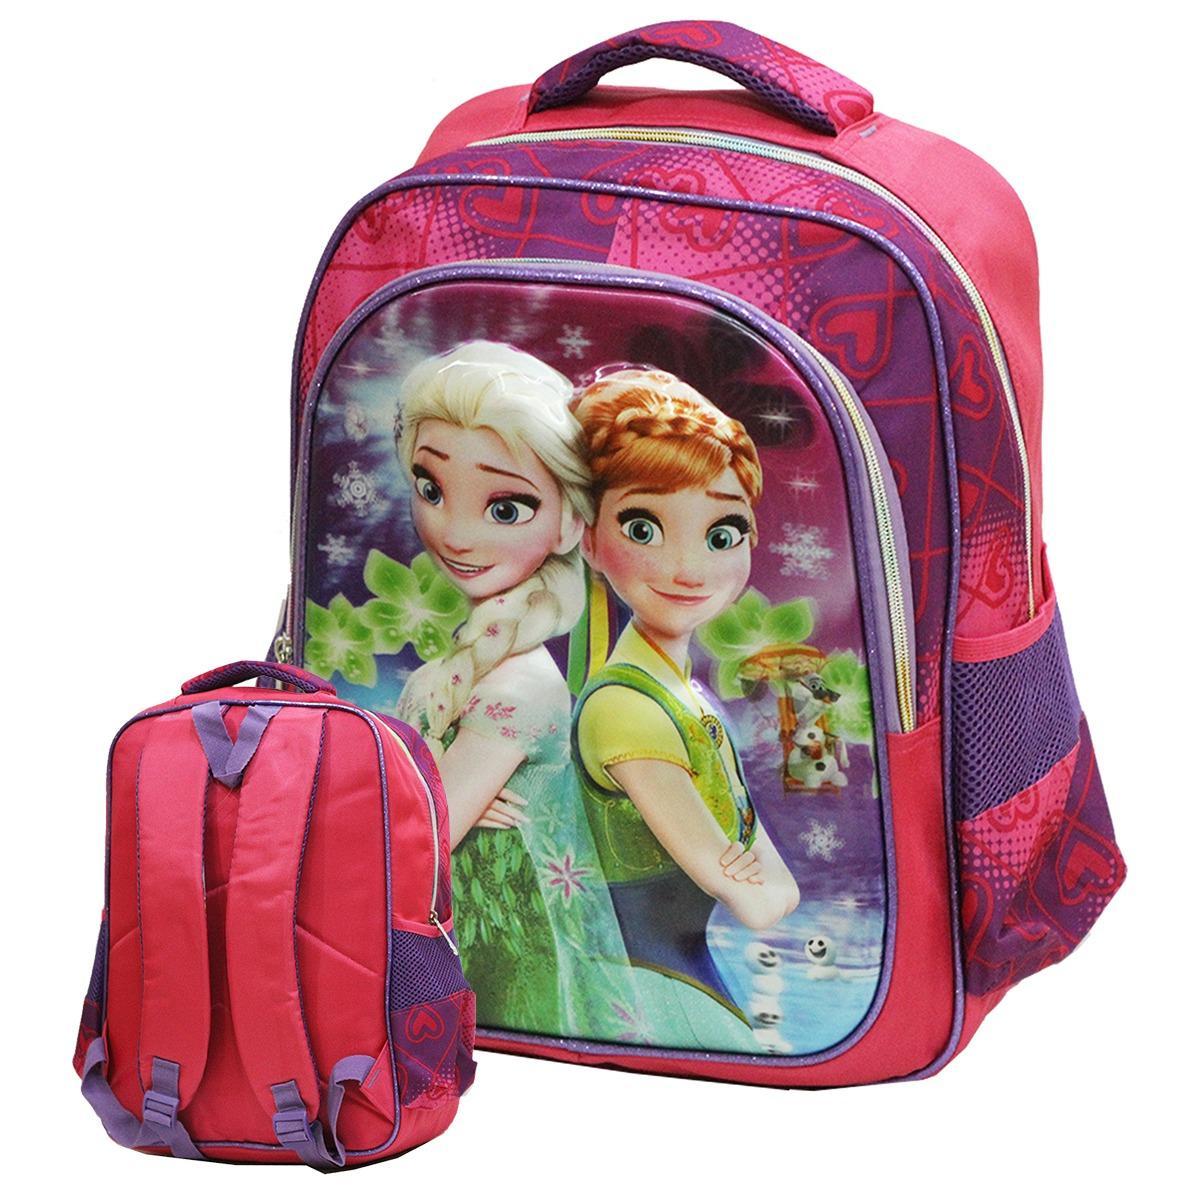 Beli Onlan Disney Frozen Fever 5D Timbul Hologram Tas Ransel Anak Sekolah Sd Dua Kantung Import Purple Yang Bagus